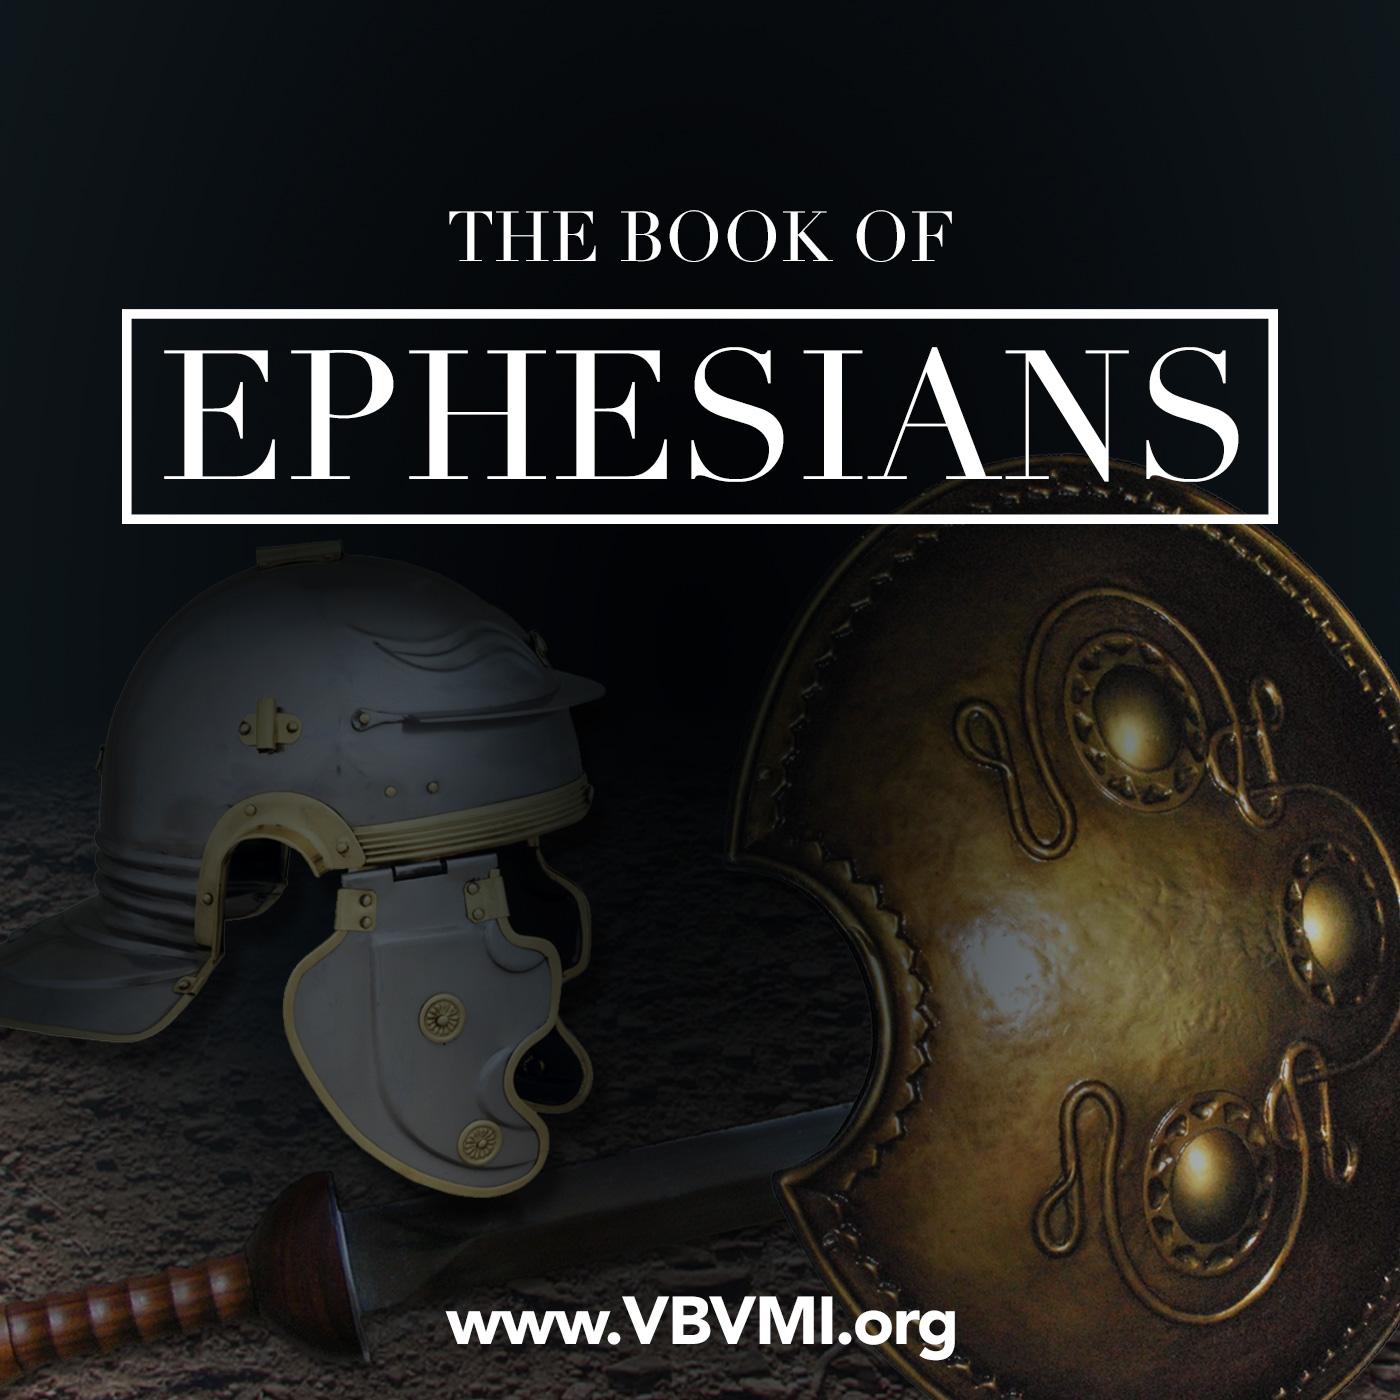 Book of Ephesians Explained - bible-studys.org